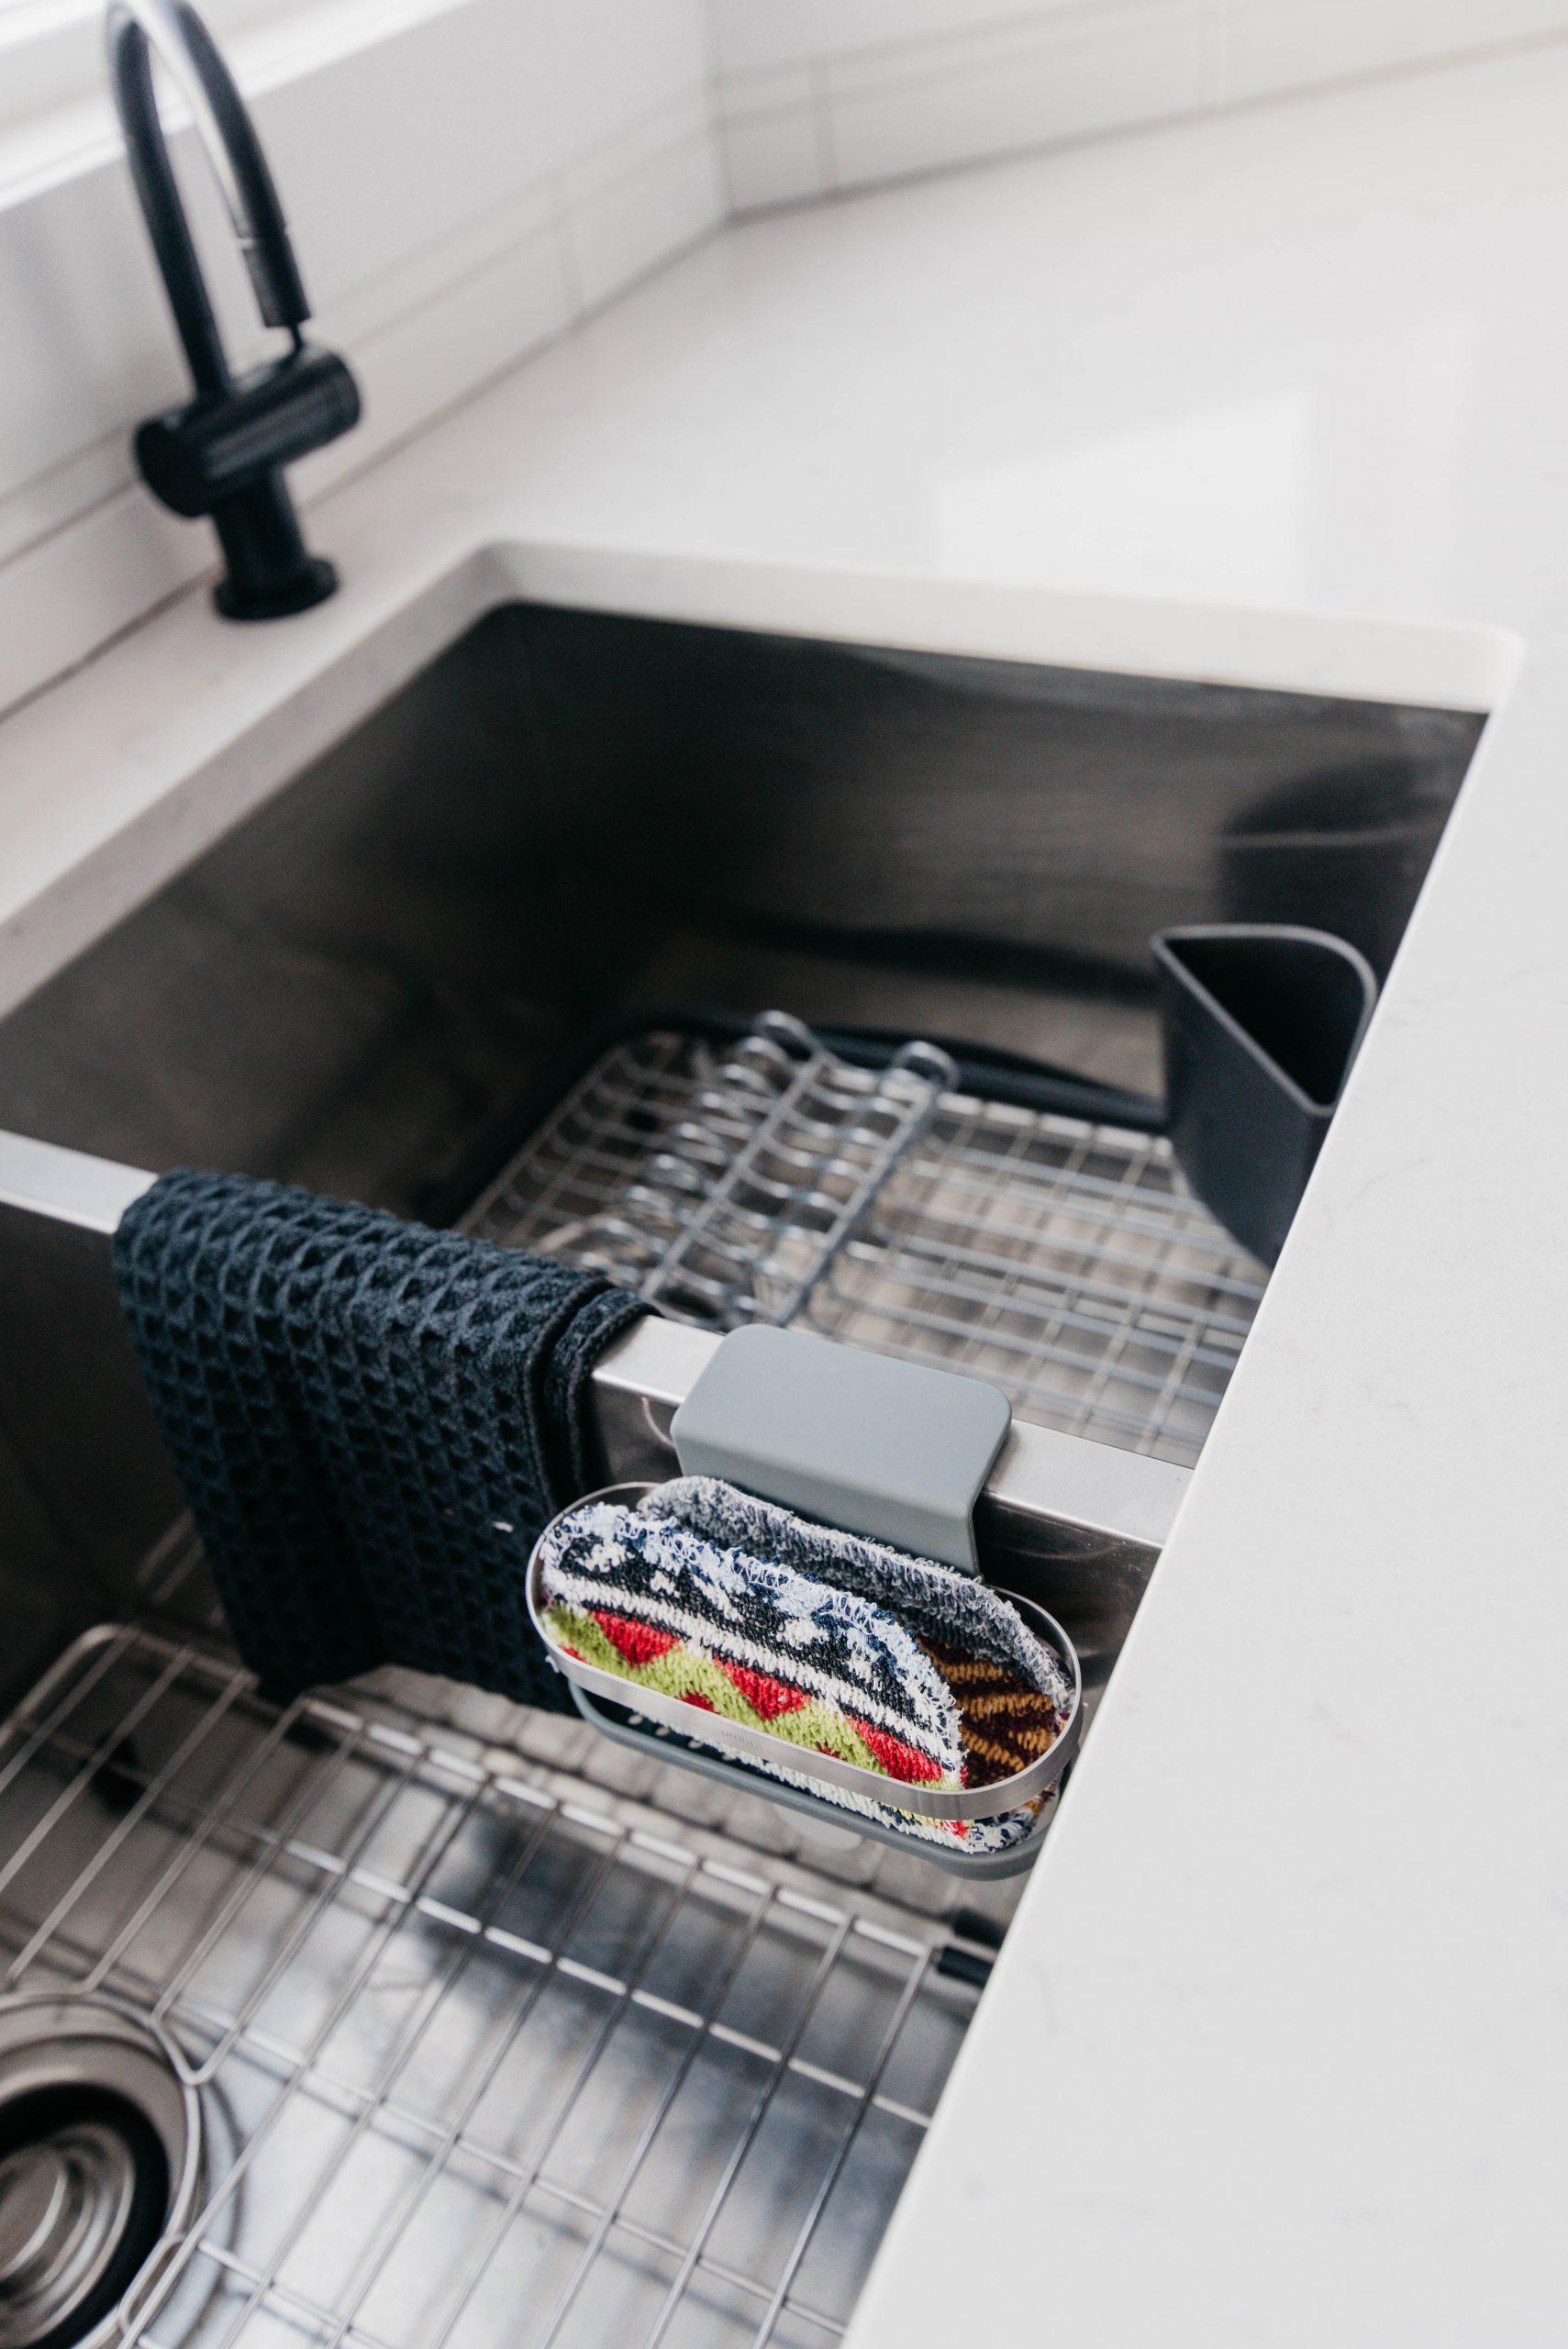 In sink organization for the kitchen